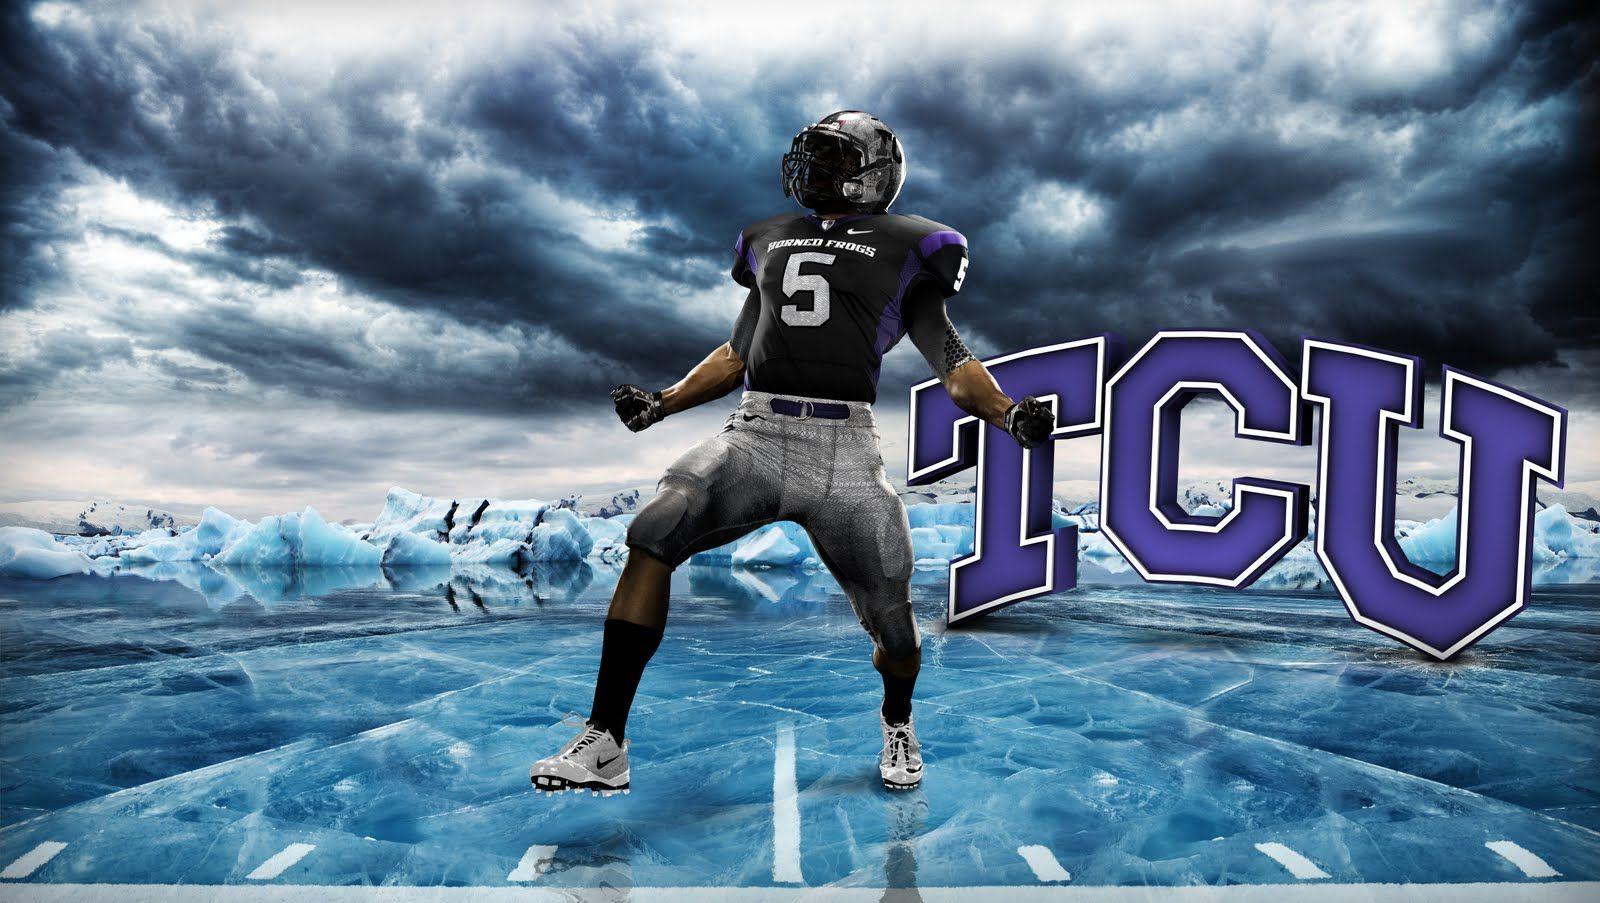 tcu pro combat sports football wallpaper college